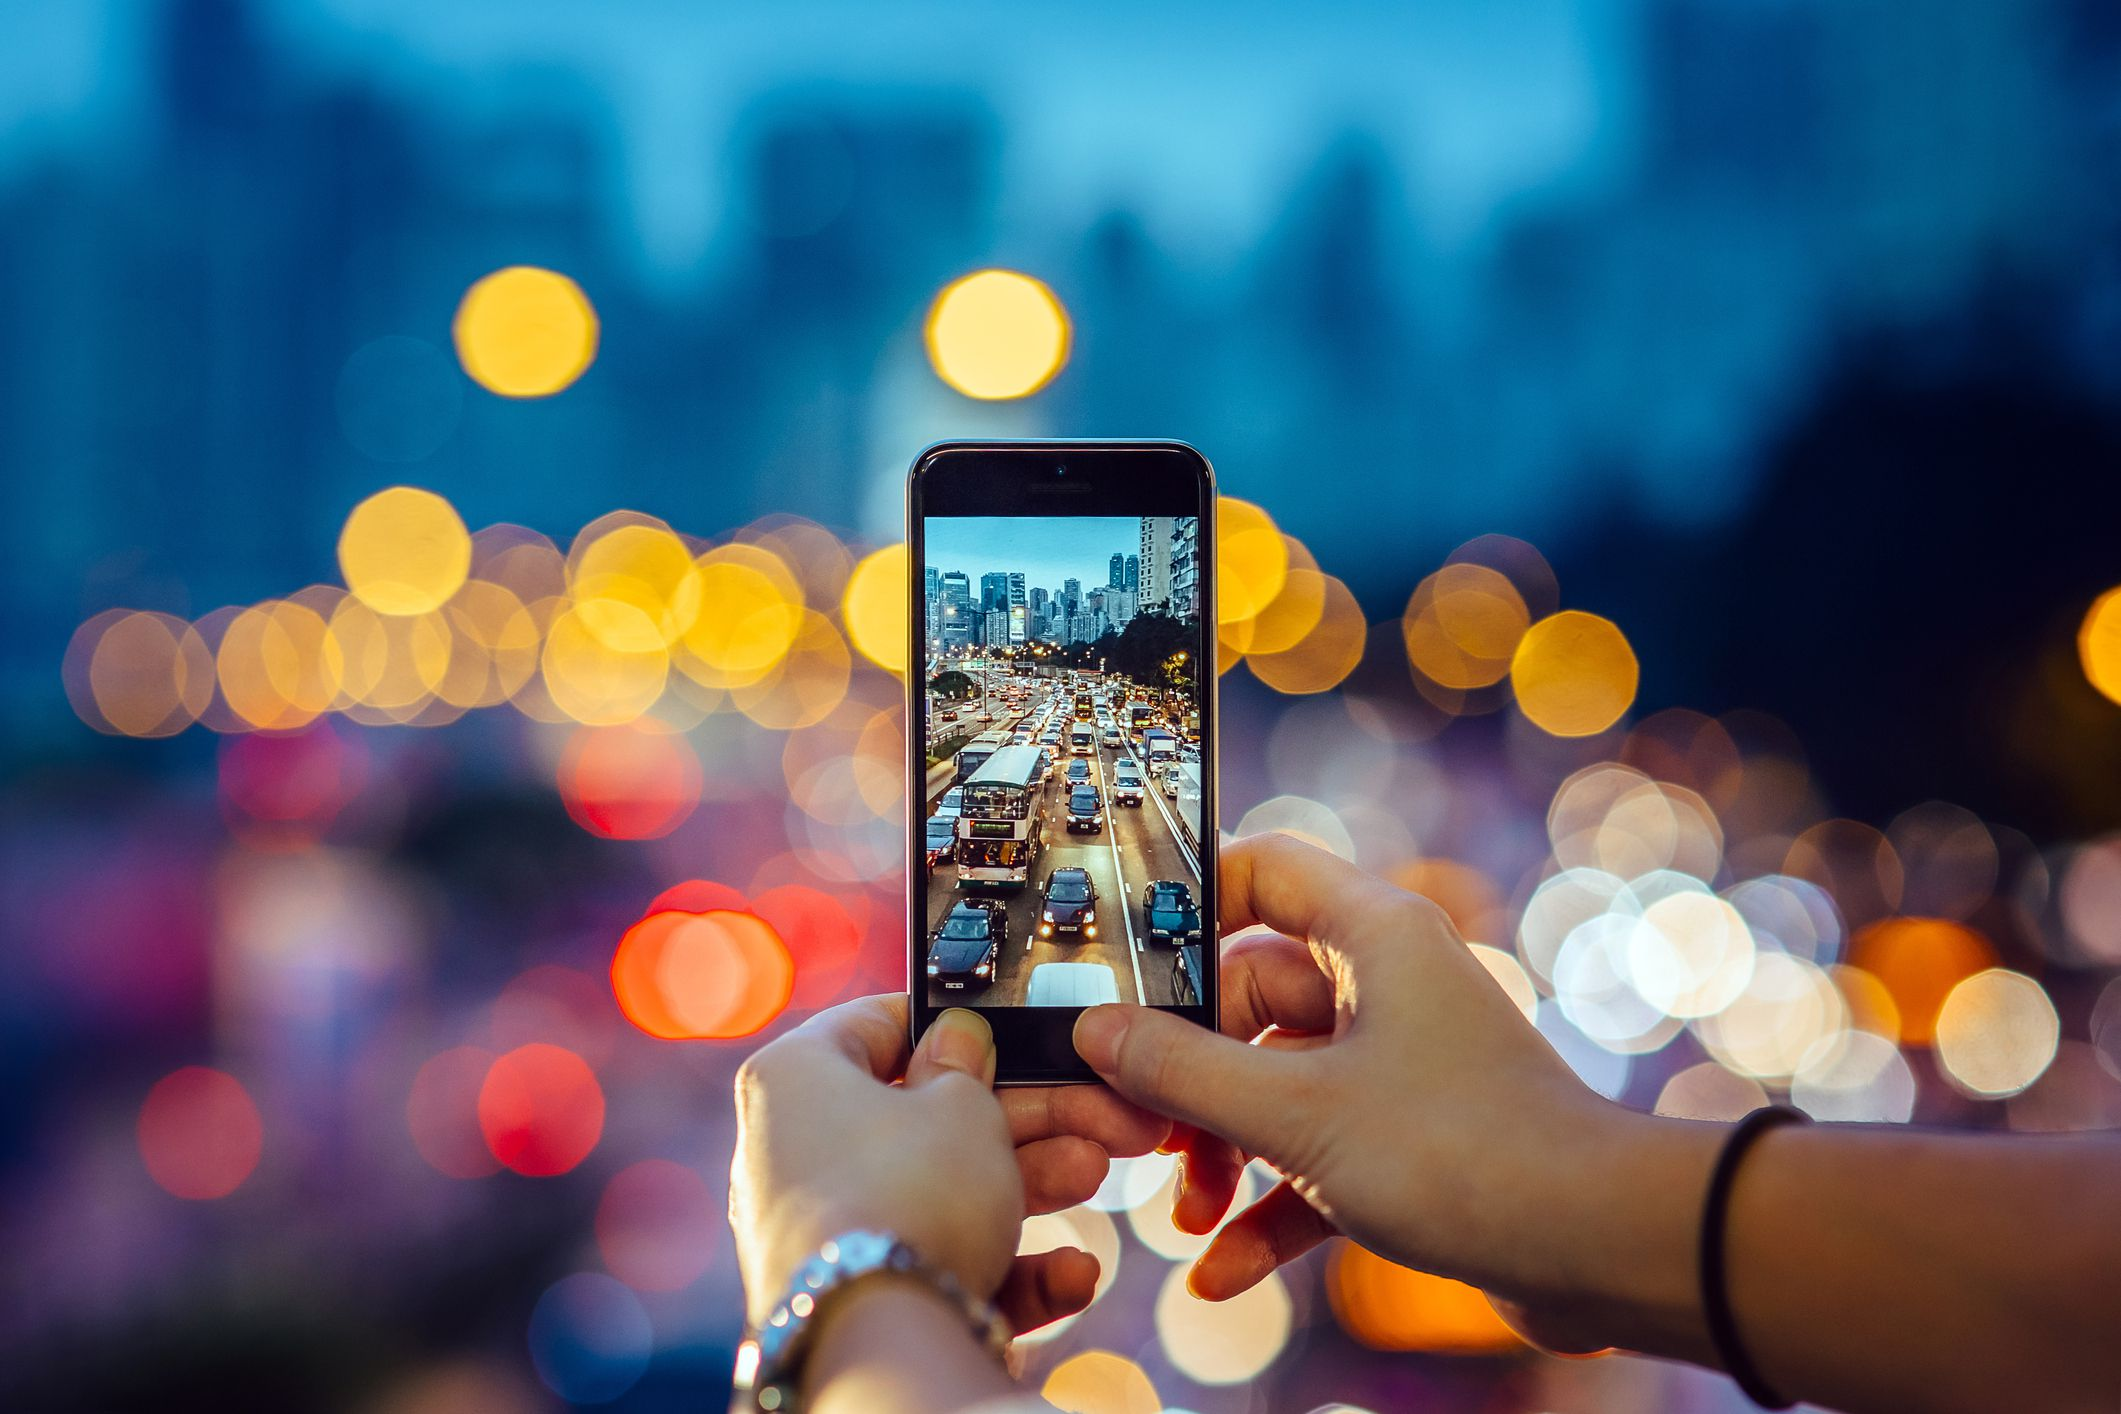 snapseed photo editor app online